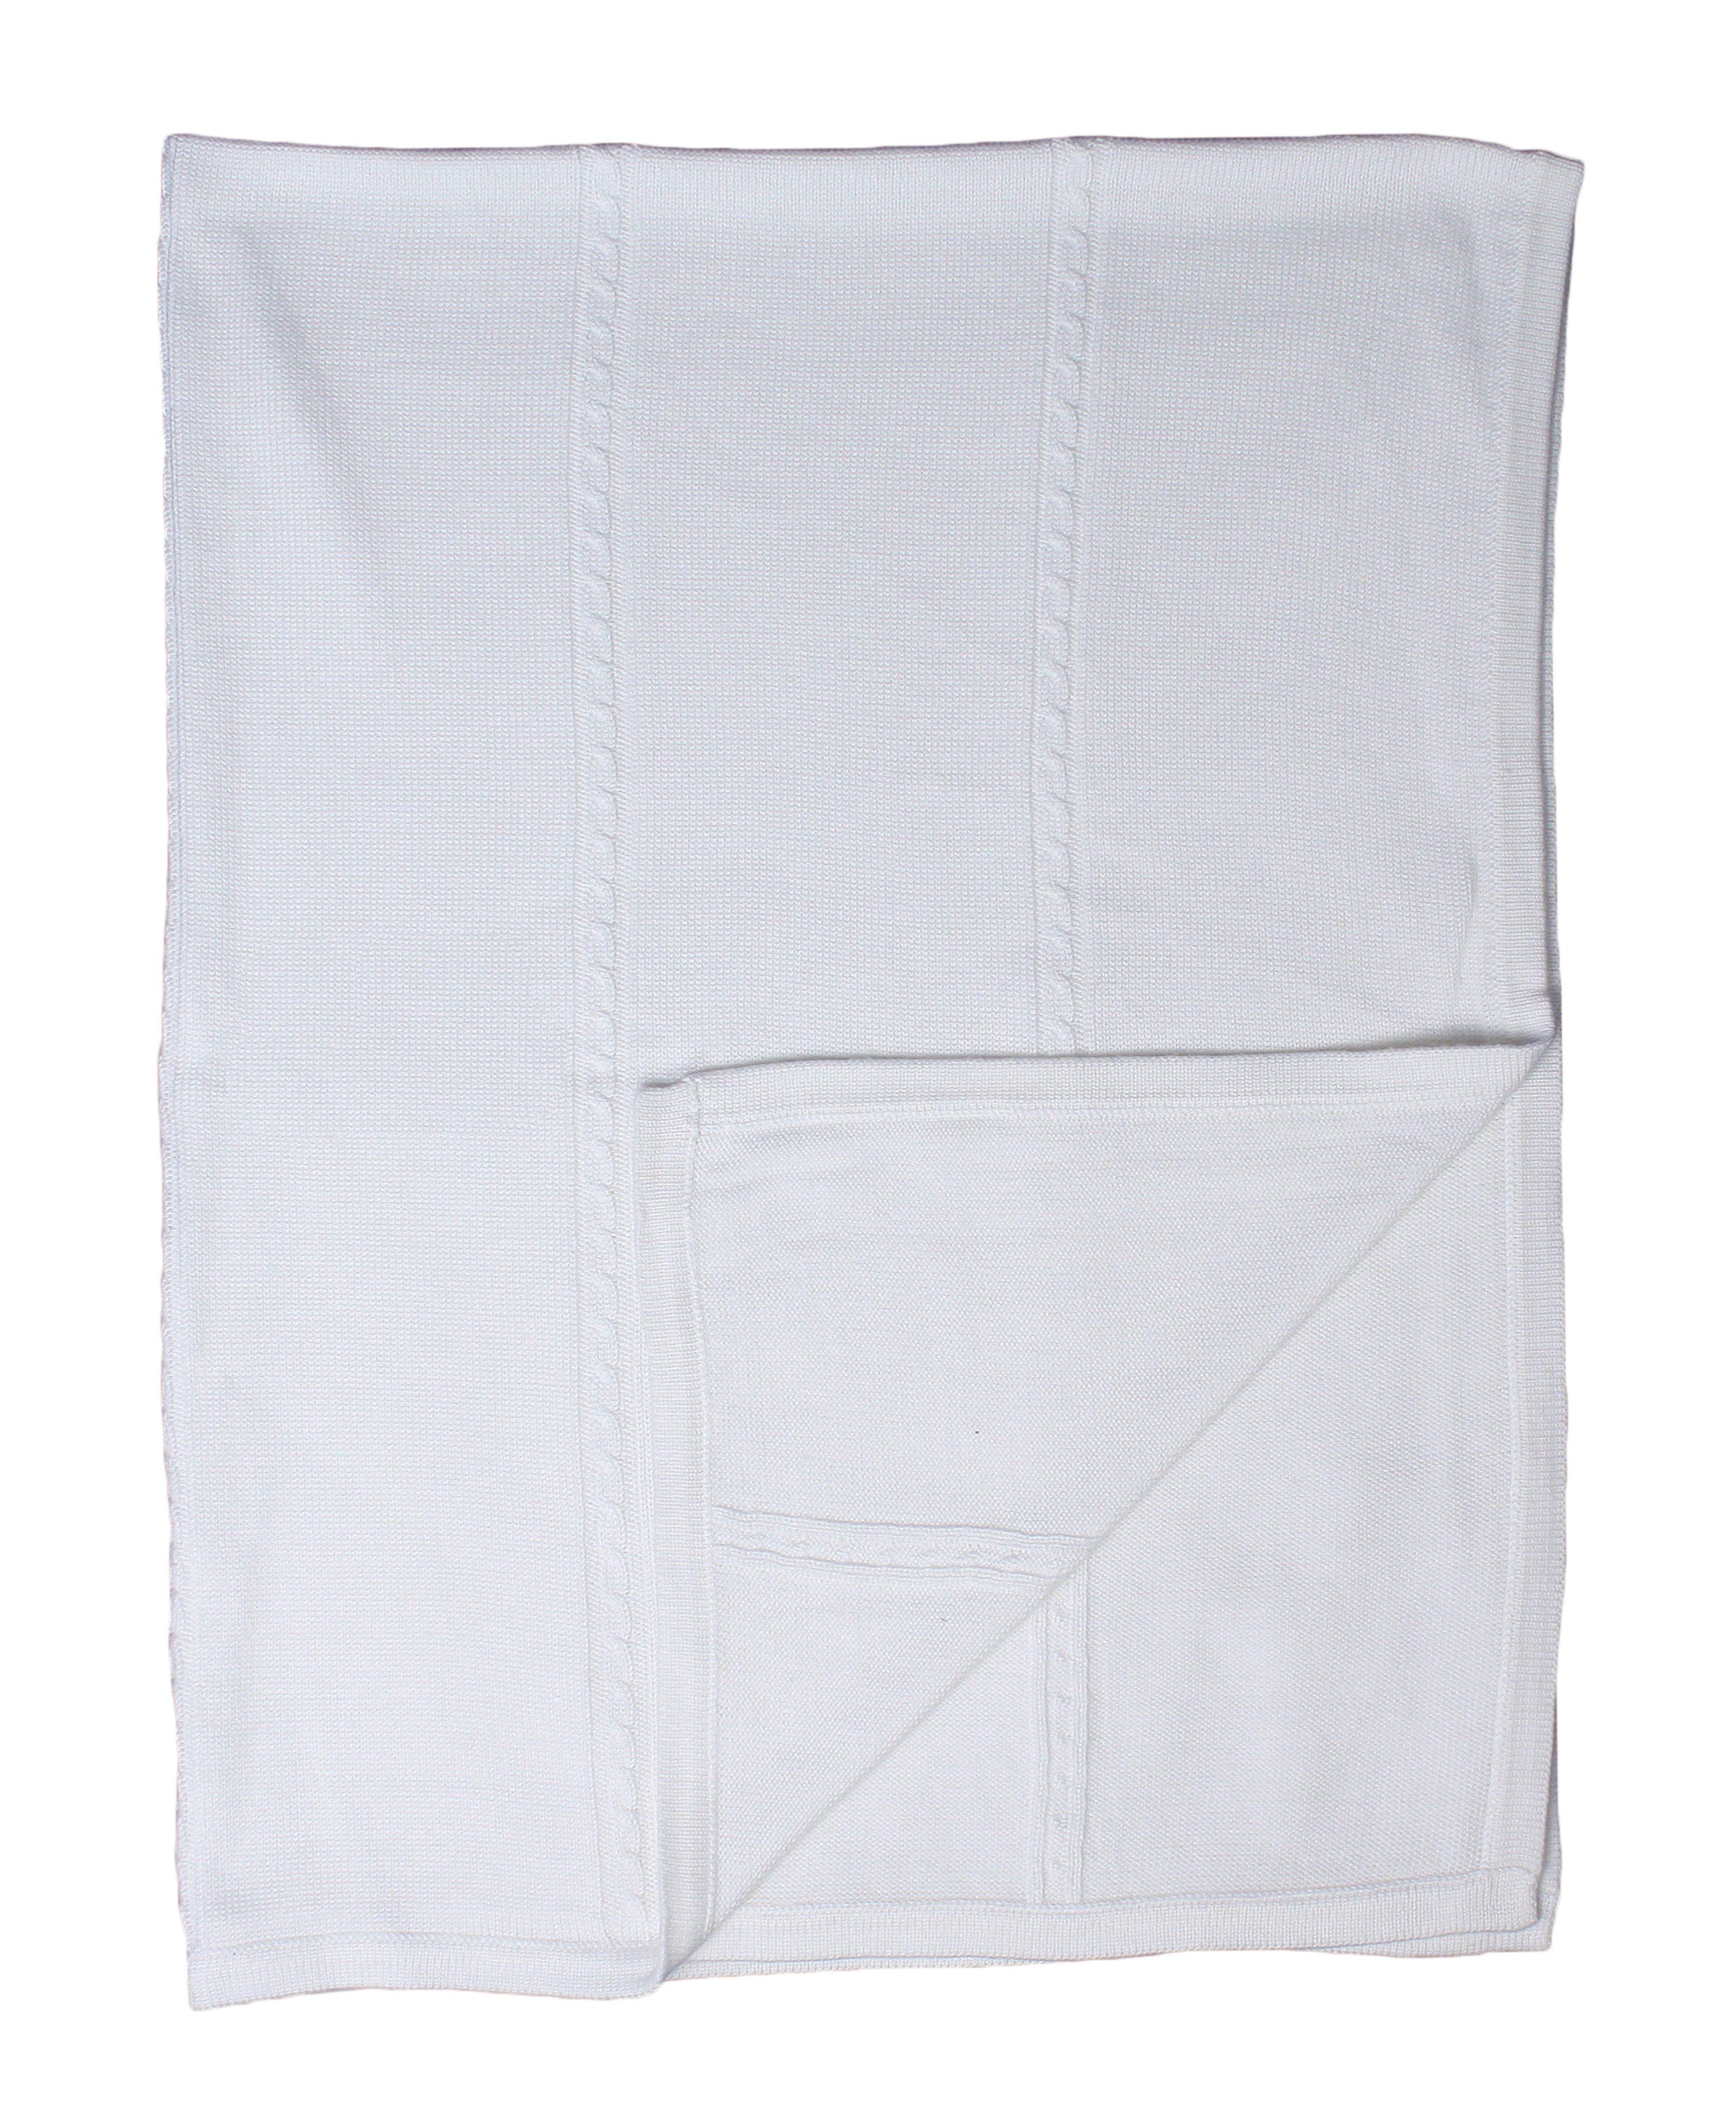 white-christening-blanket-cable-knit-pattern.jpg